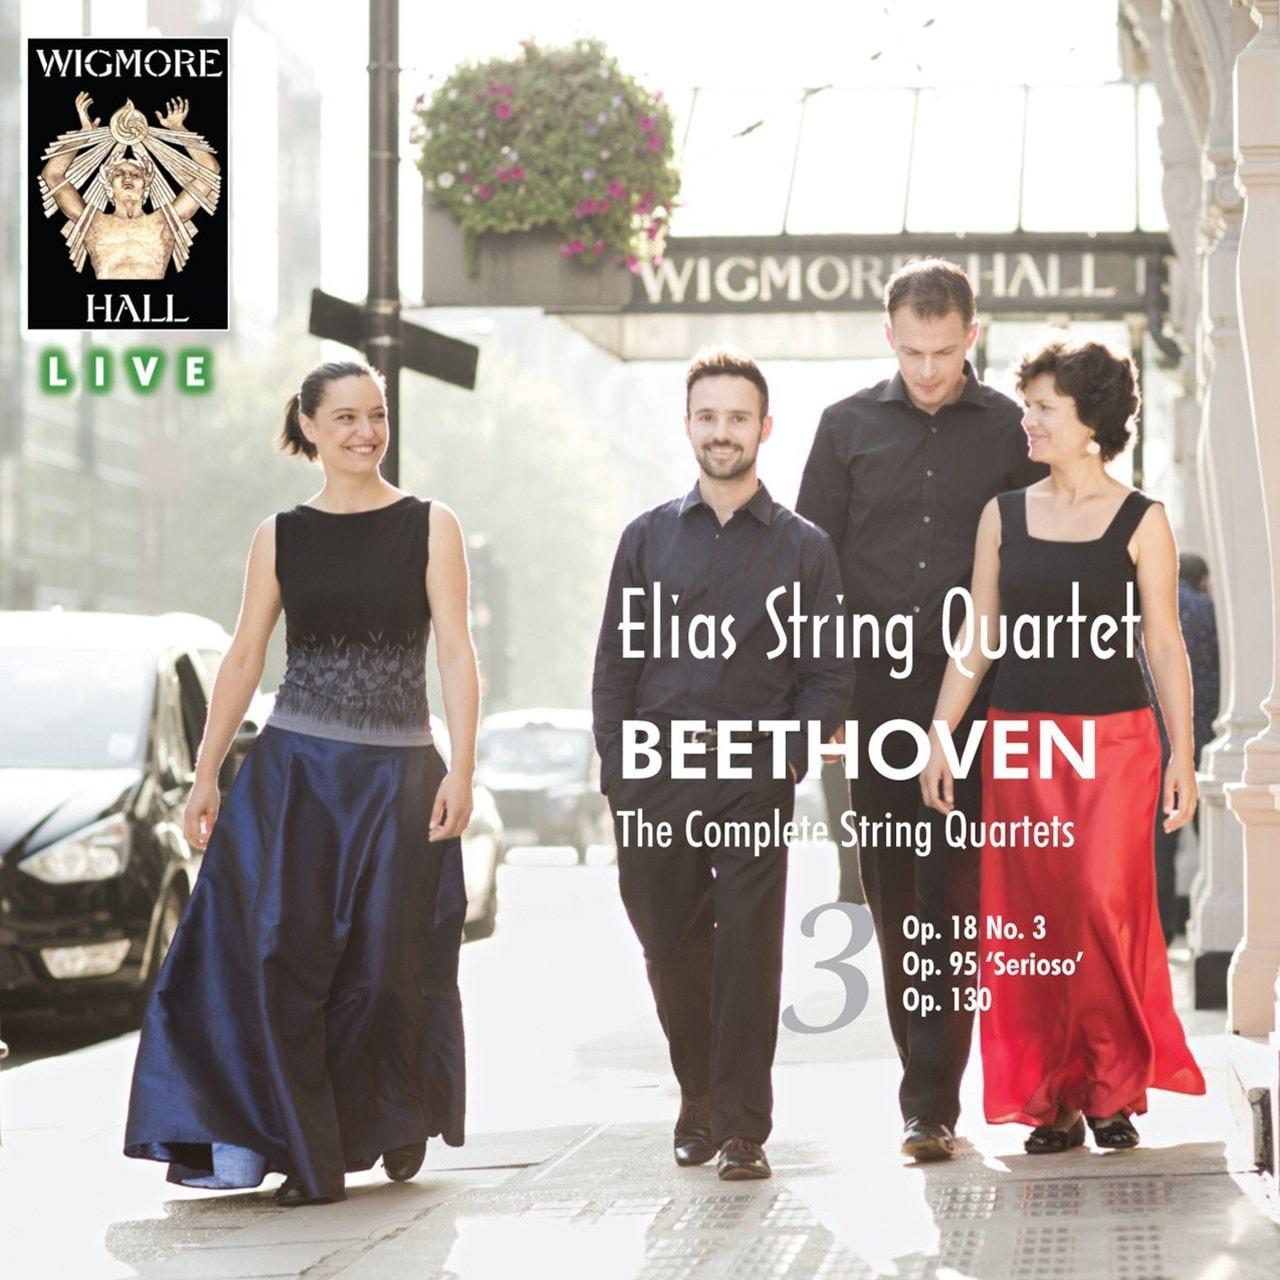 Elias String Quartet: Beethoven - The Complete String Quartets - Volume 3 - 1